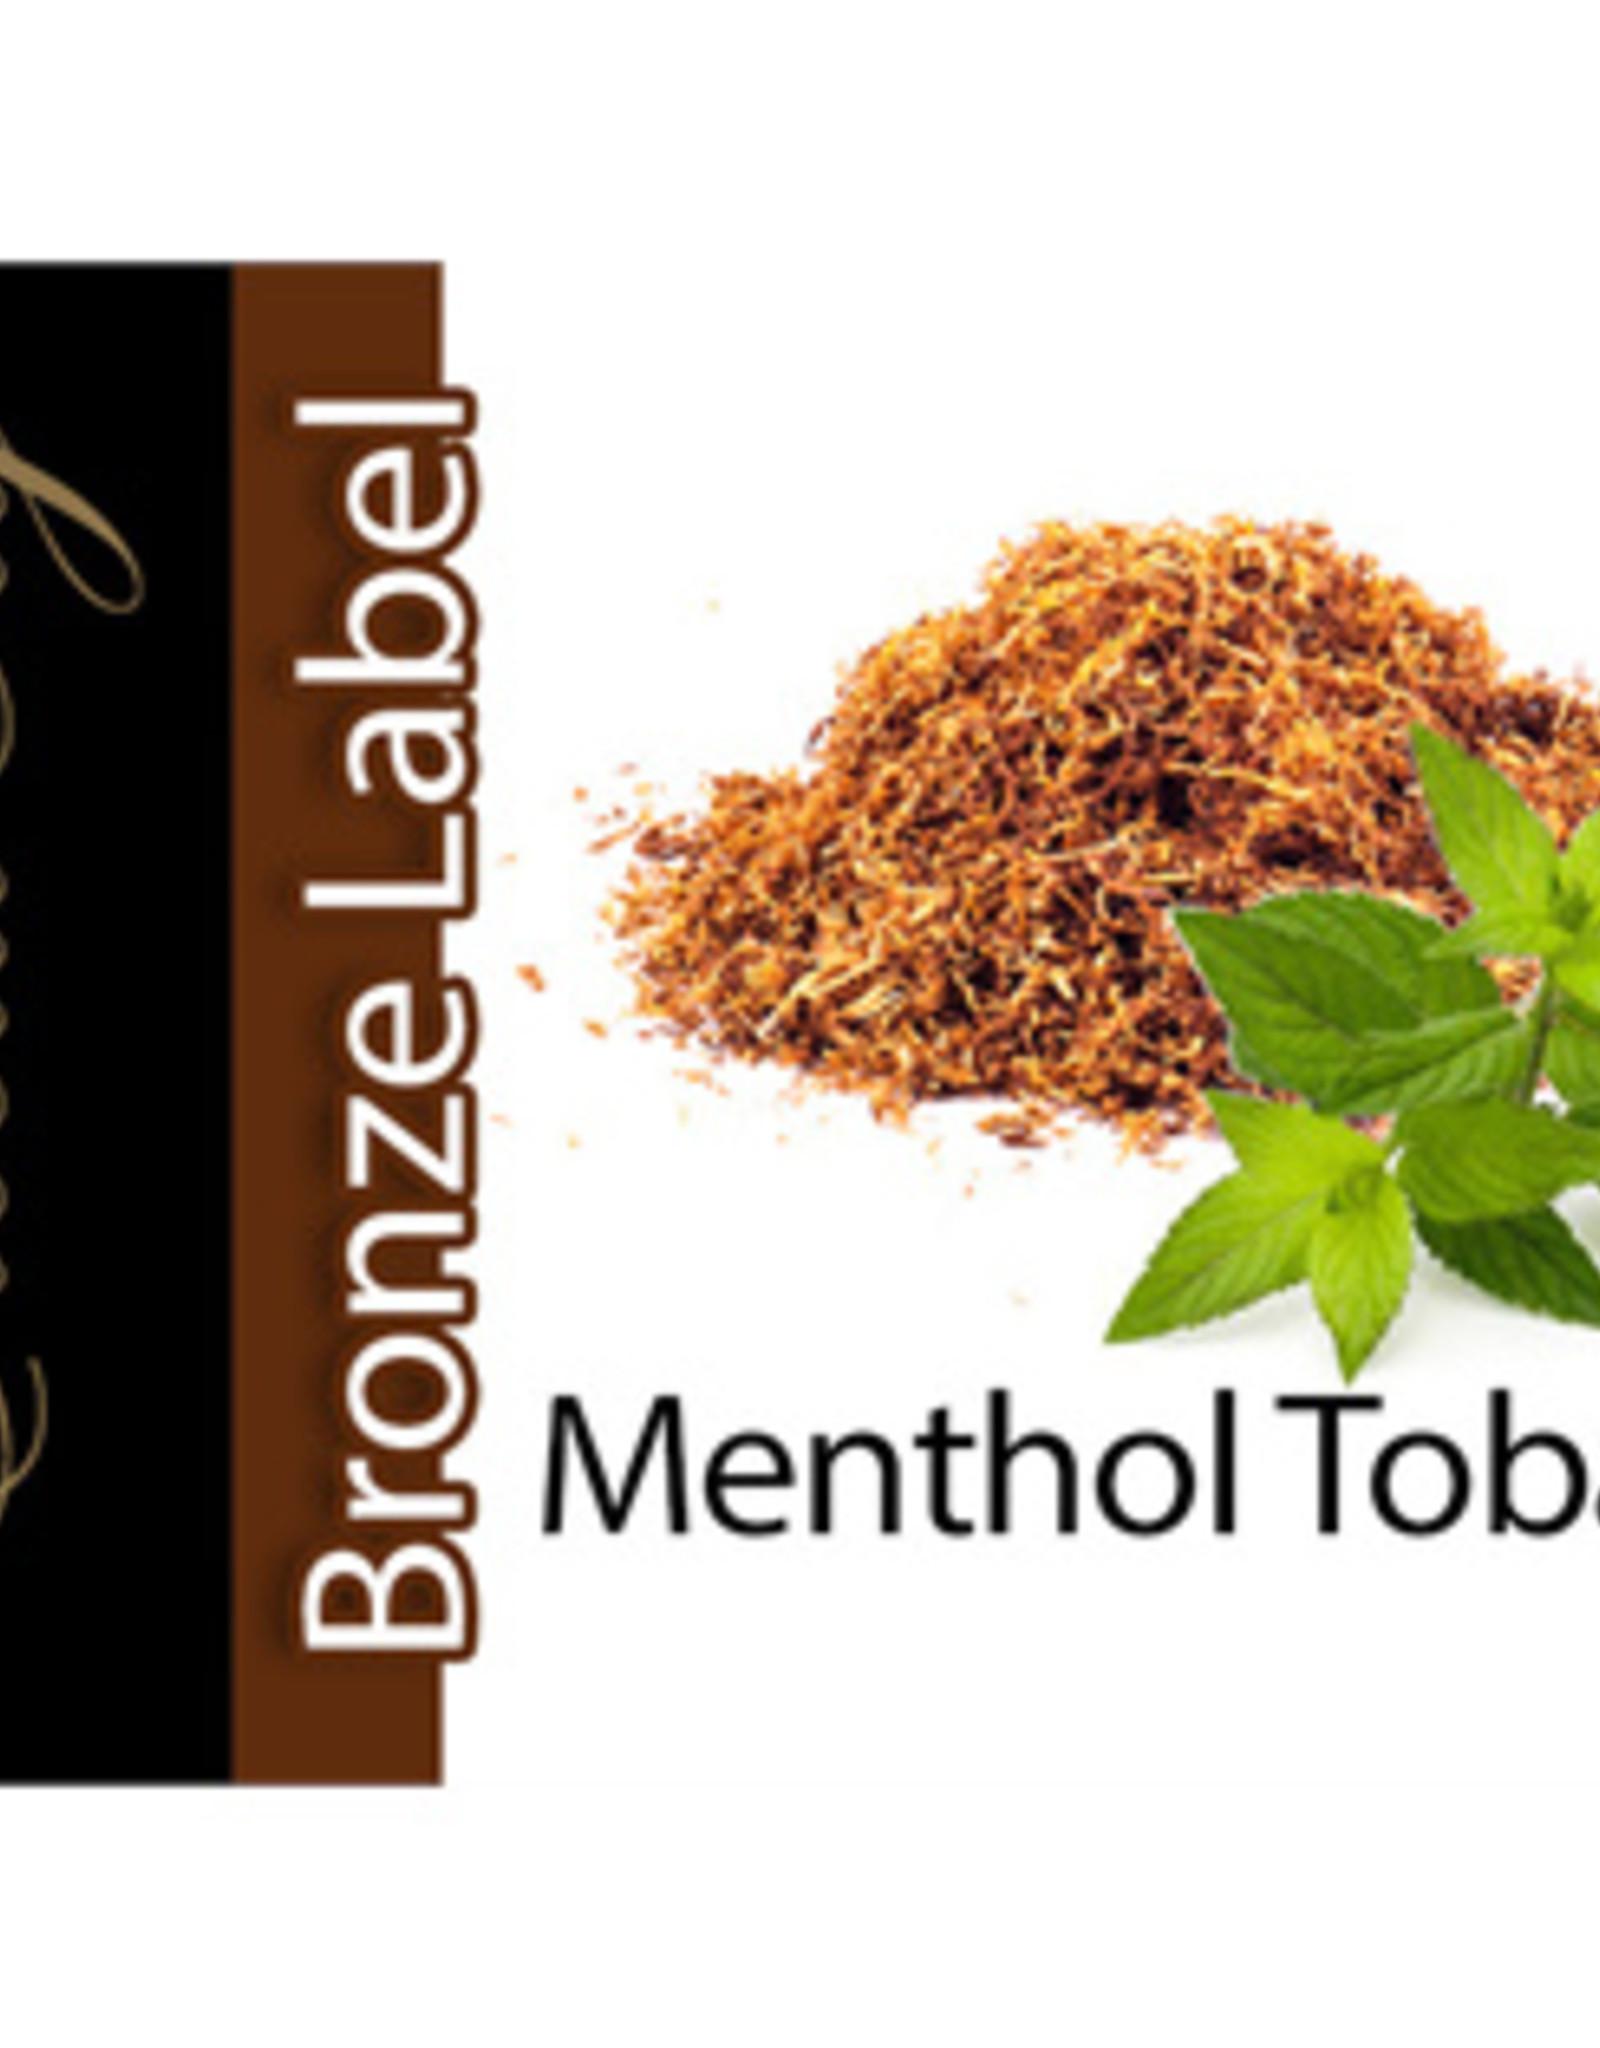 Exclucig Exclucig Bronze Label E-liquid Menthol Tobacco 6 mg Nicotine